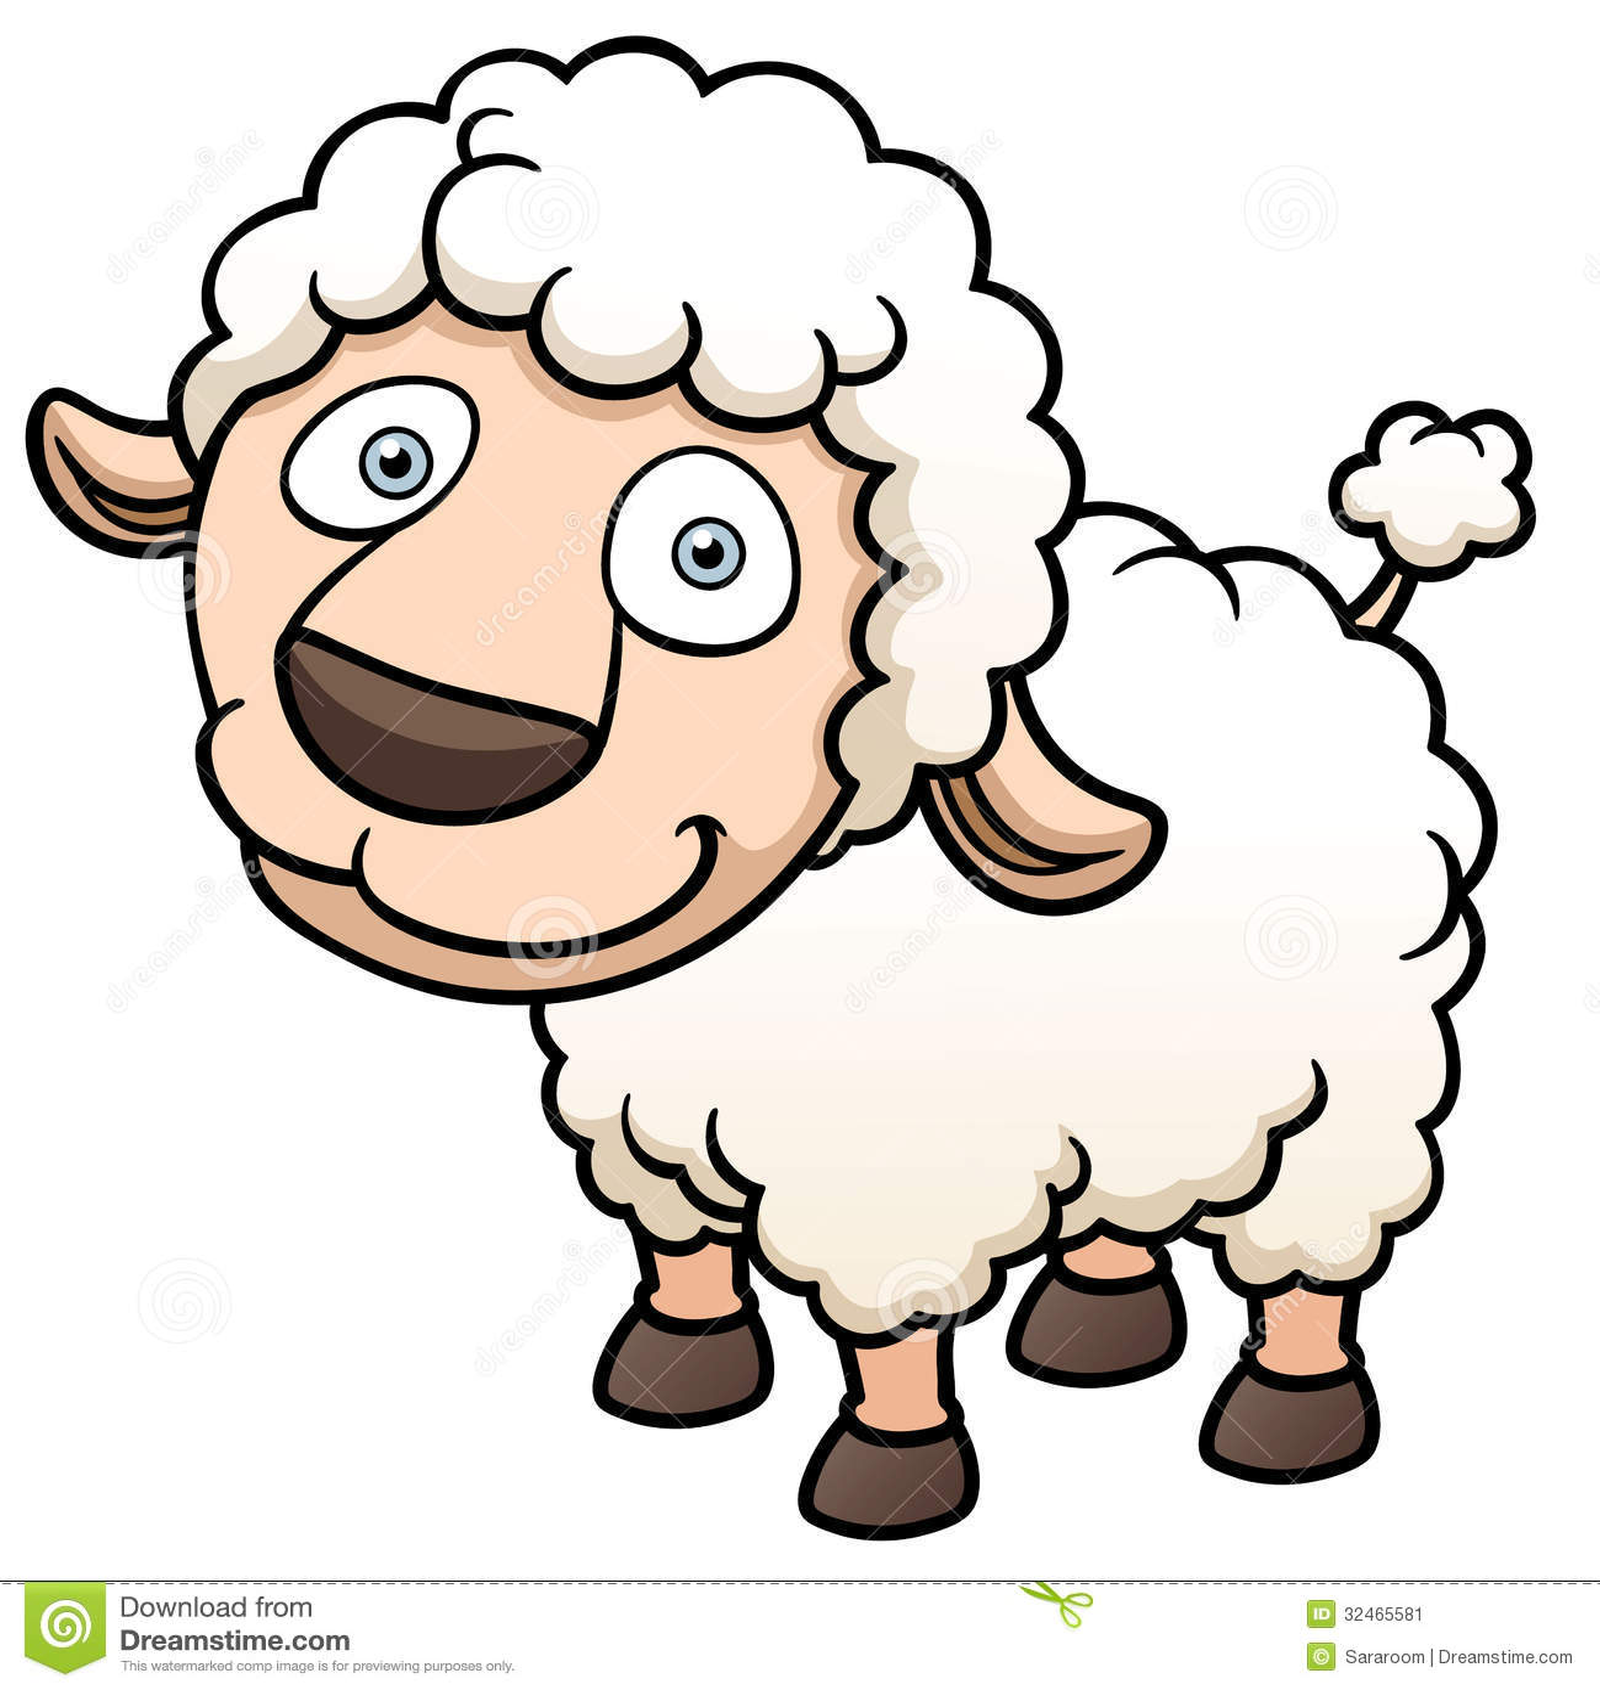 Cartoon Sheep Stock Vector Illustration Of Isolated